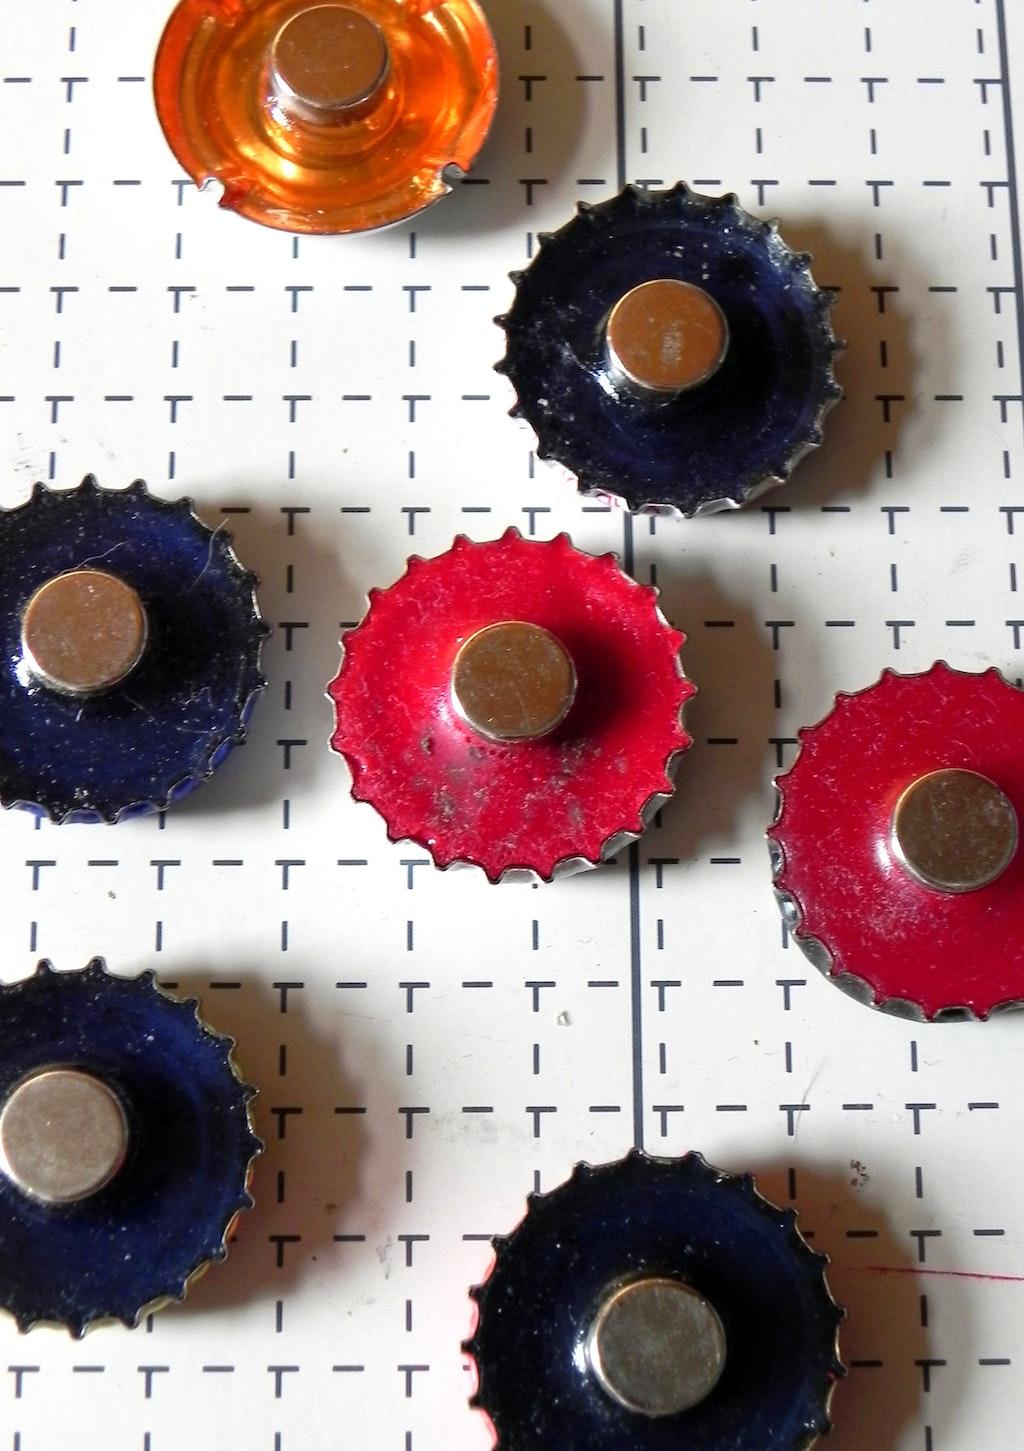 Tinkering with bottle caps: Bottle cap magnets - supermagnete de